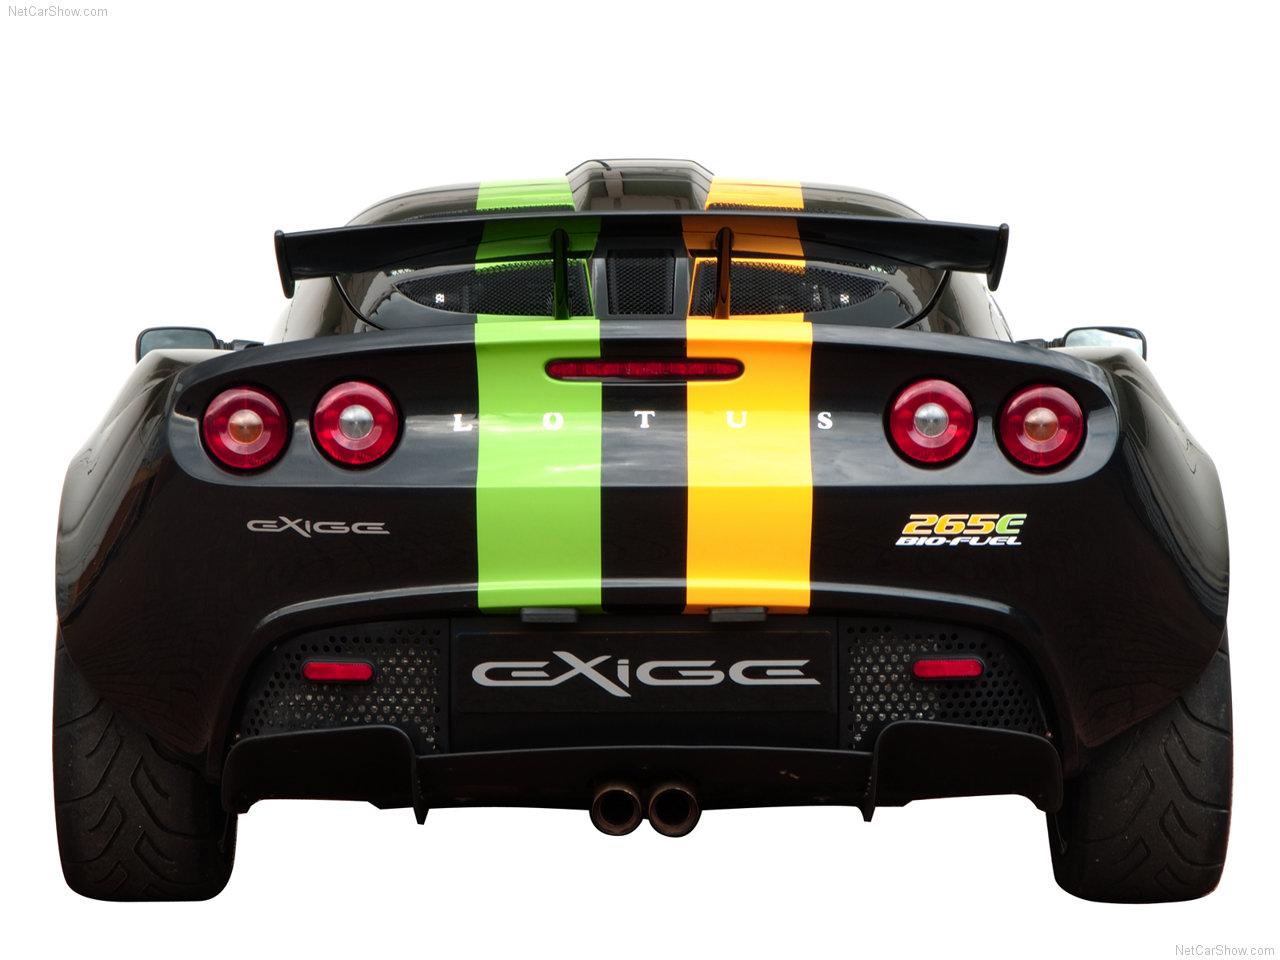 https://automobilecar.files.wordpress.com/2009/07/lotus-exige_265e_concept_2006_1280x960_wallpaper_09.jpg